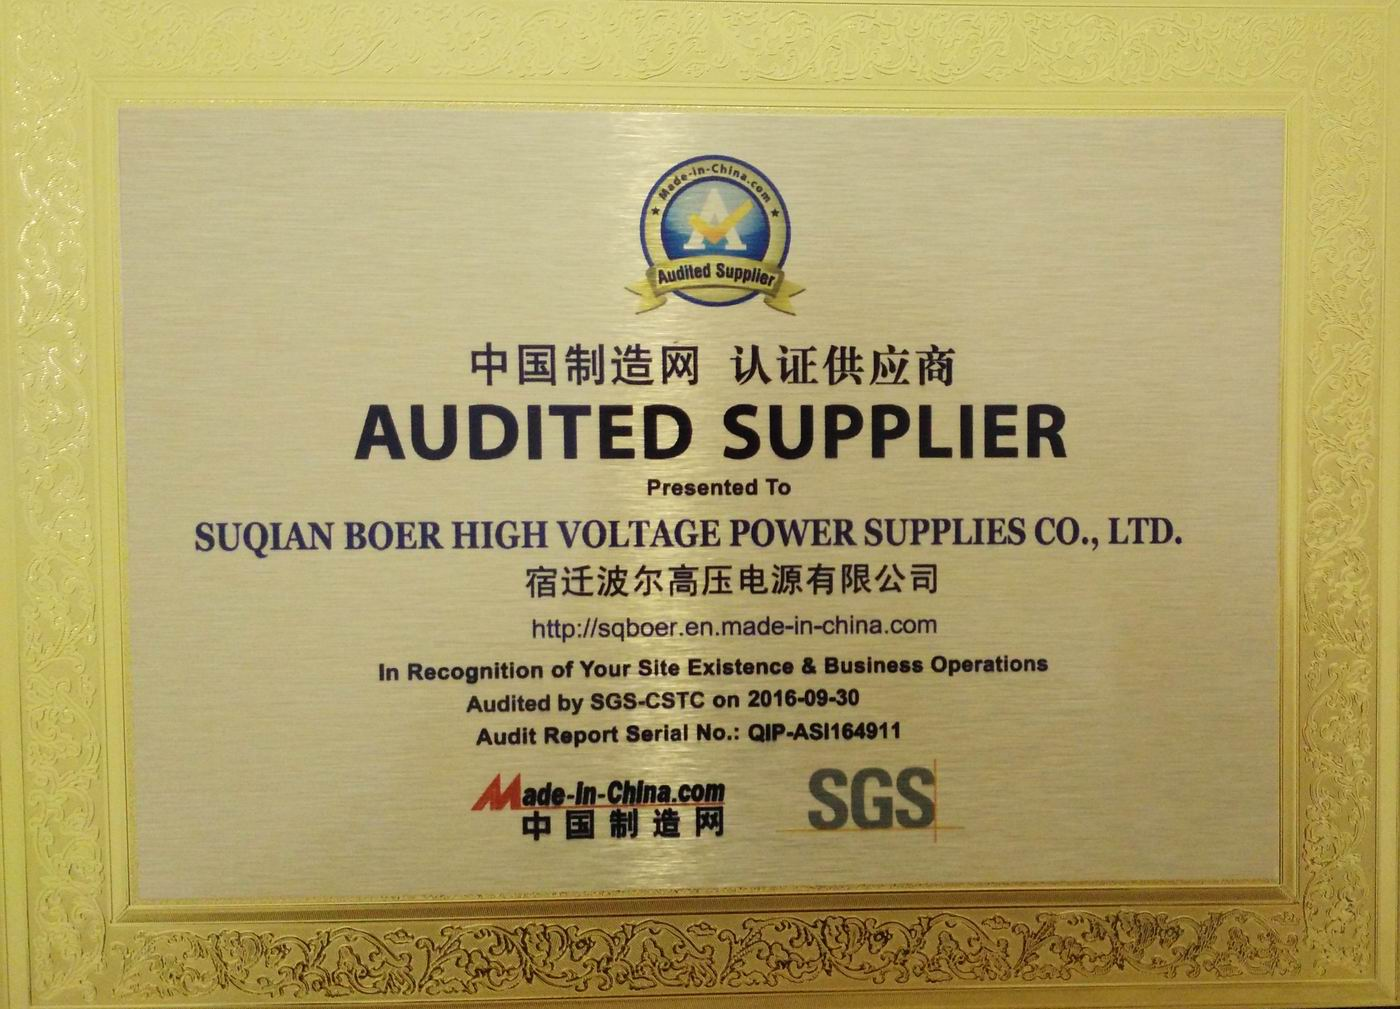 Audited Supplier Certificate by Switzerland SGS